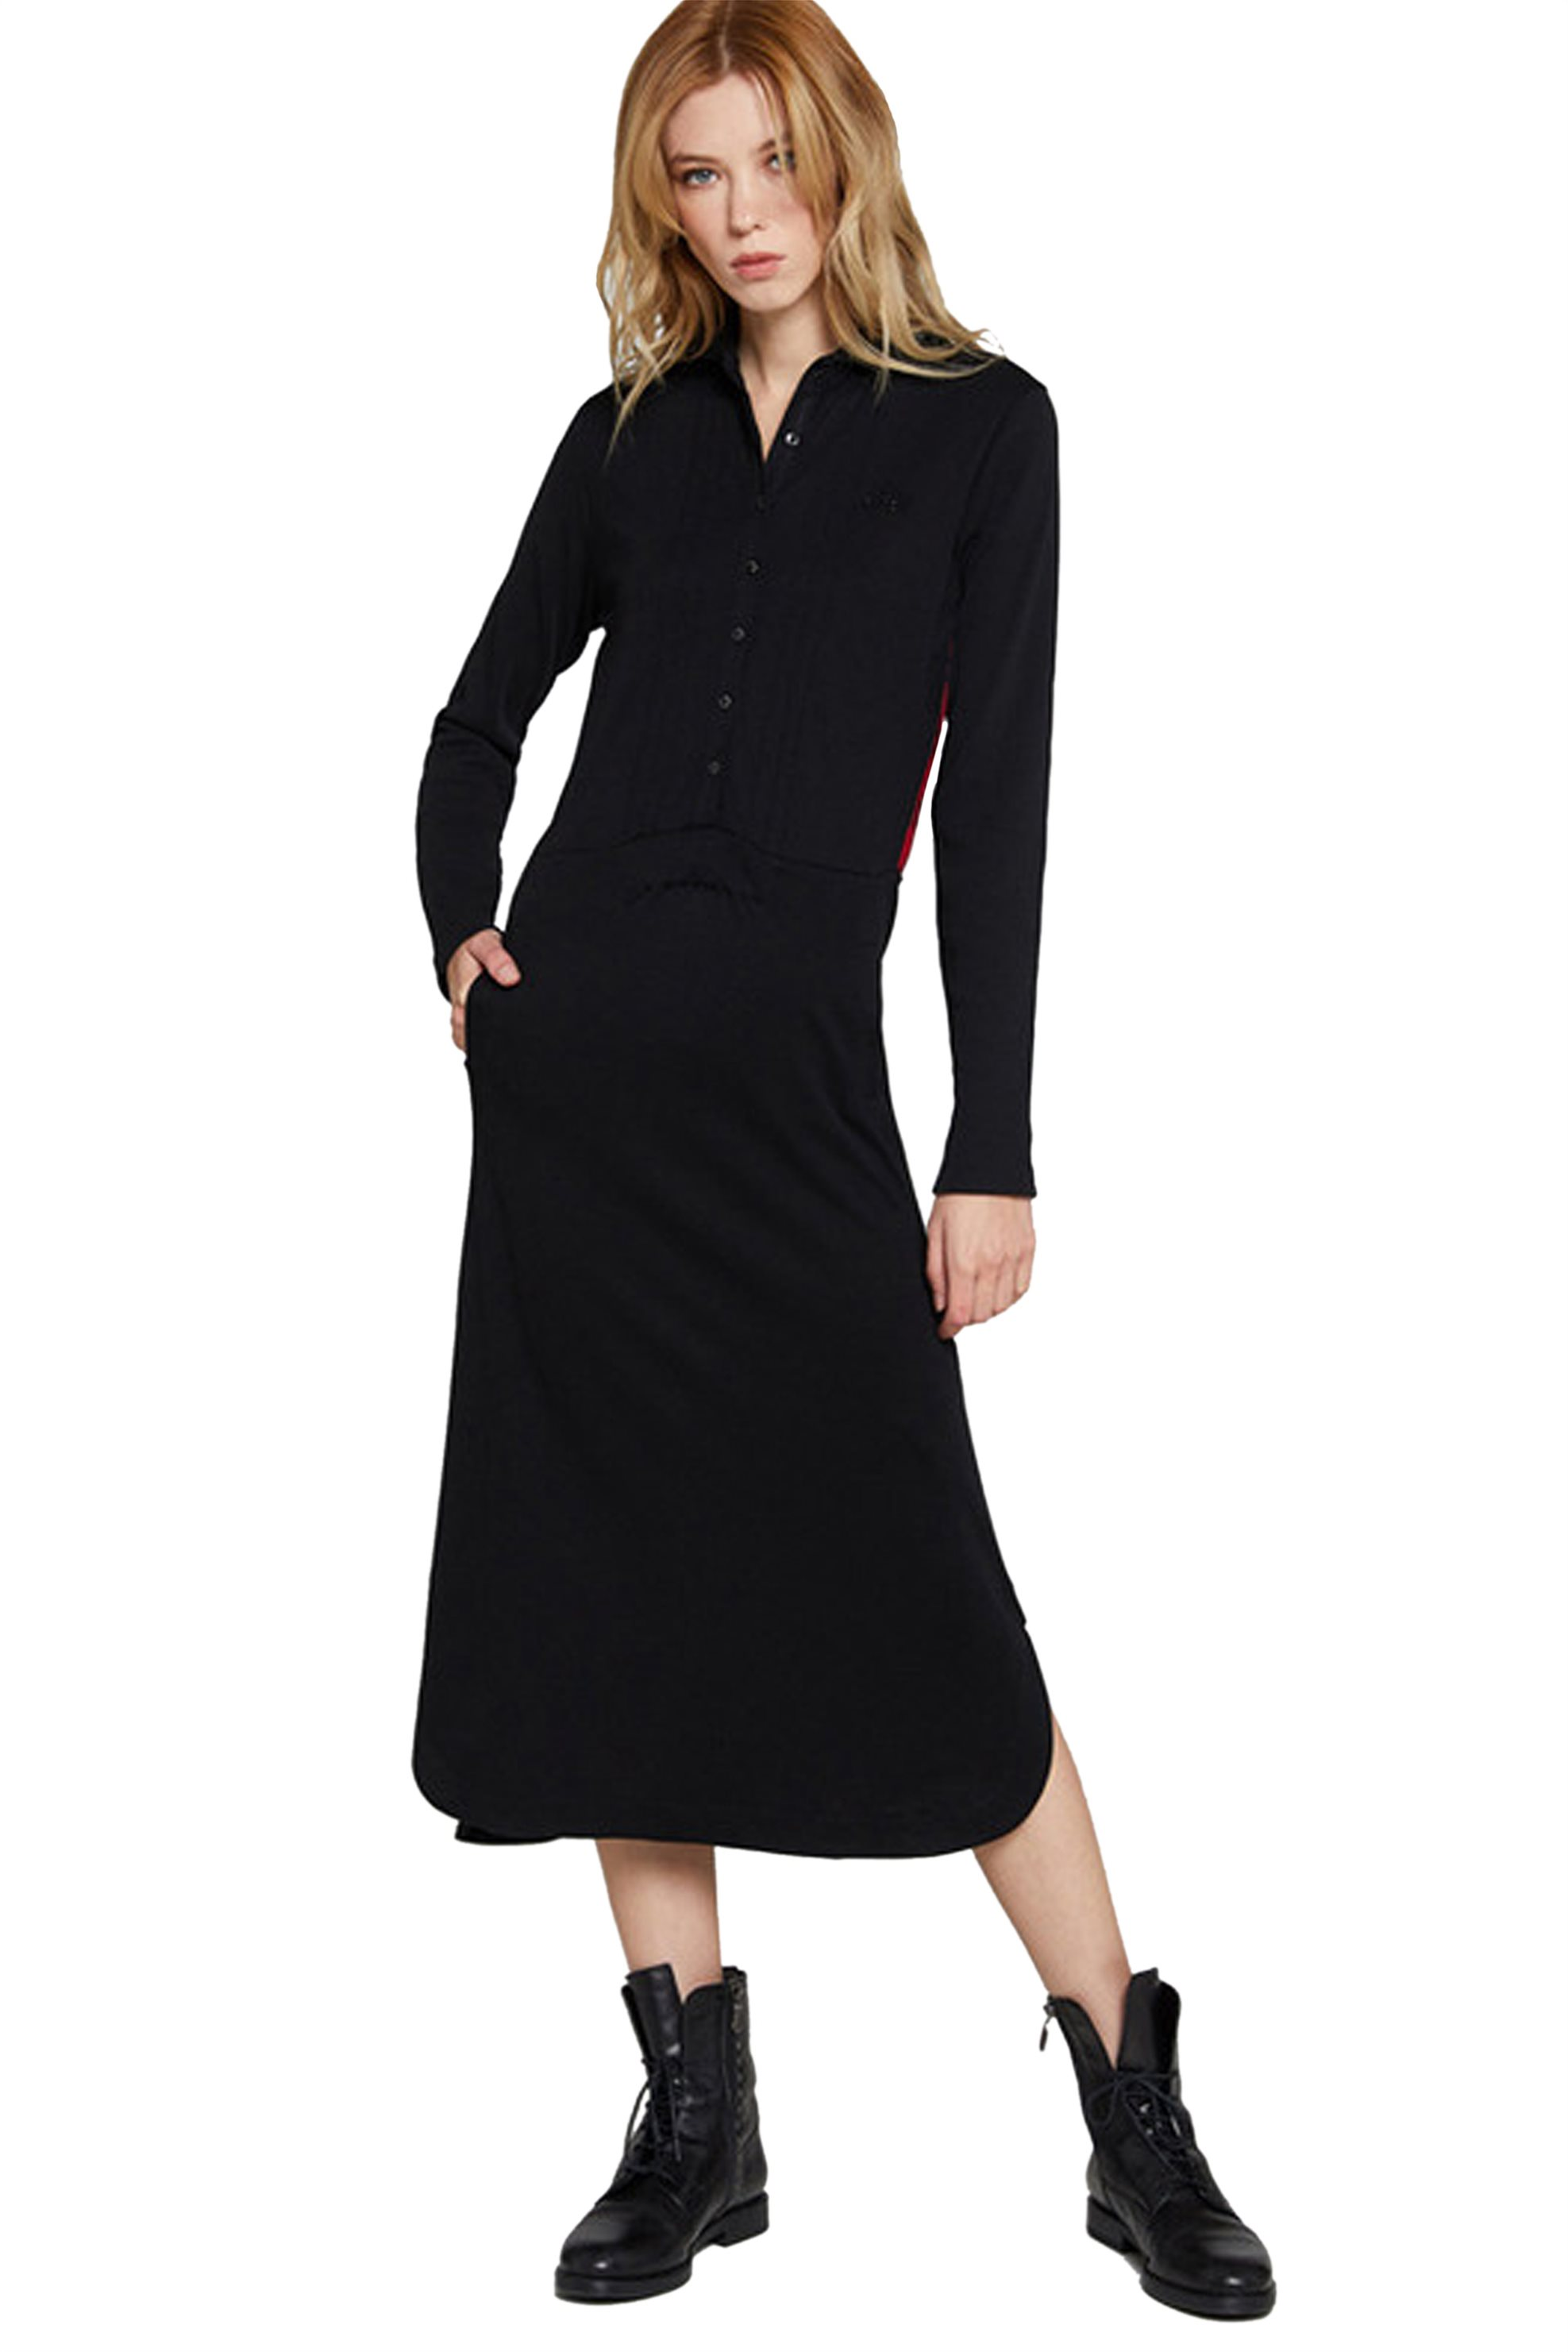 La Martina Γυναικείo Φόρεμα Με Καρό Πλάτη Isotta - MWD600-PK033 - Μαύρο